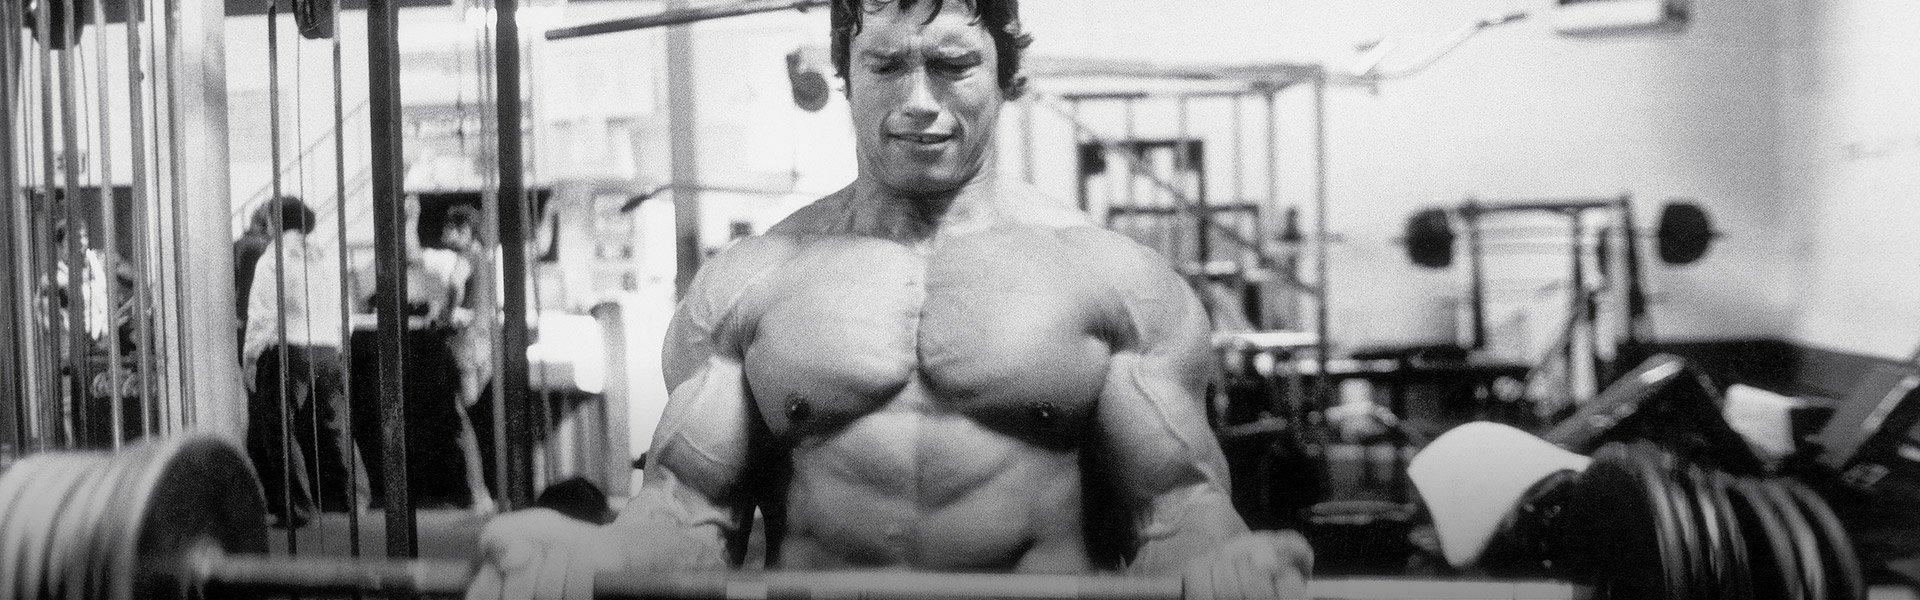 Arnold schwarzenegger 6 day workout plan sport fatare 1000 images arnold schwarzenegger blueprint malvernweather Images